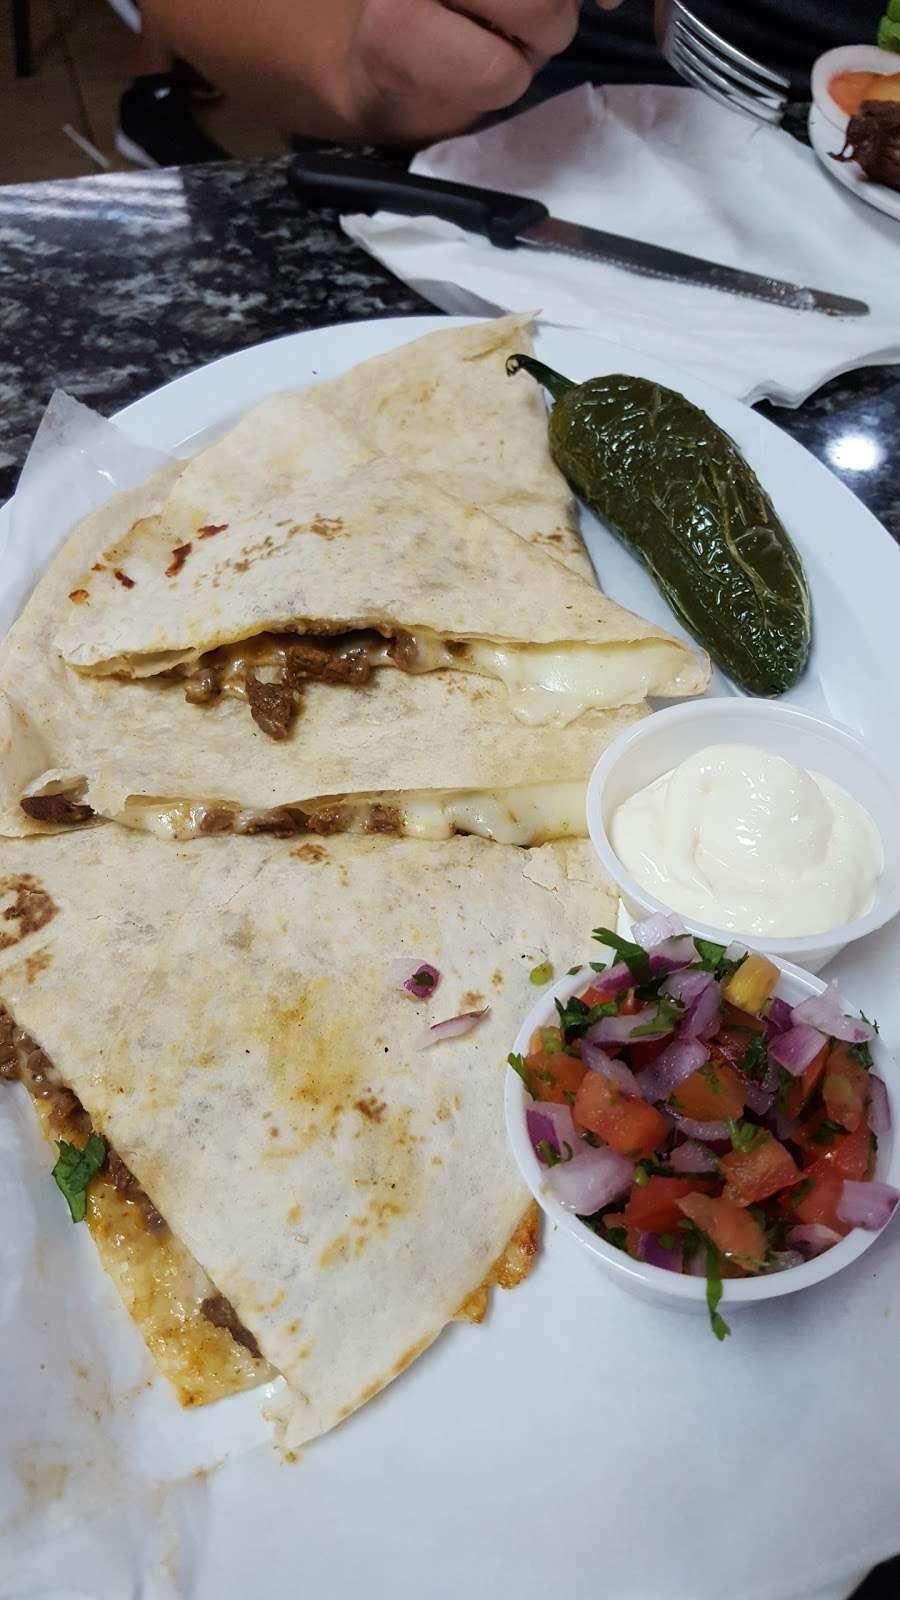 Taqueria El Torito - restaurant  | Photo 9 of 10 | Address: 1409 Central Ave, Kansas City, KS 66102, USA | Phone: (913) 233-0463